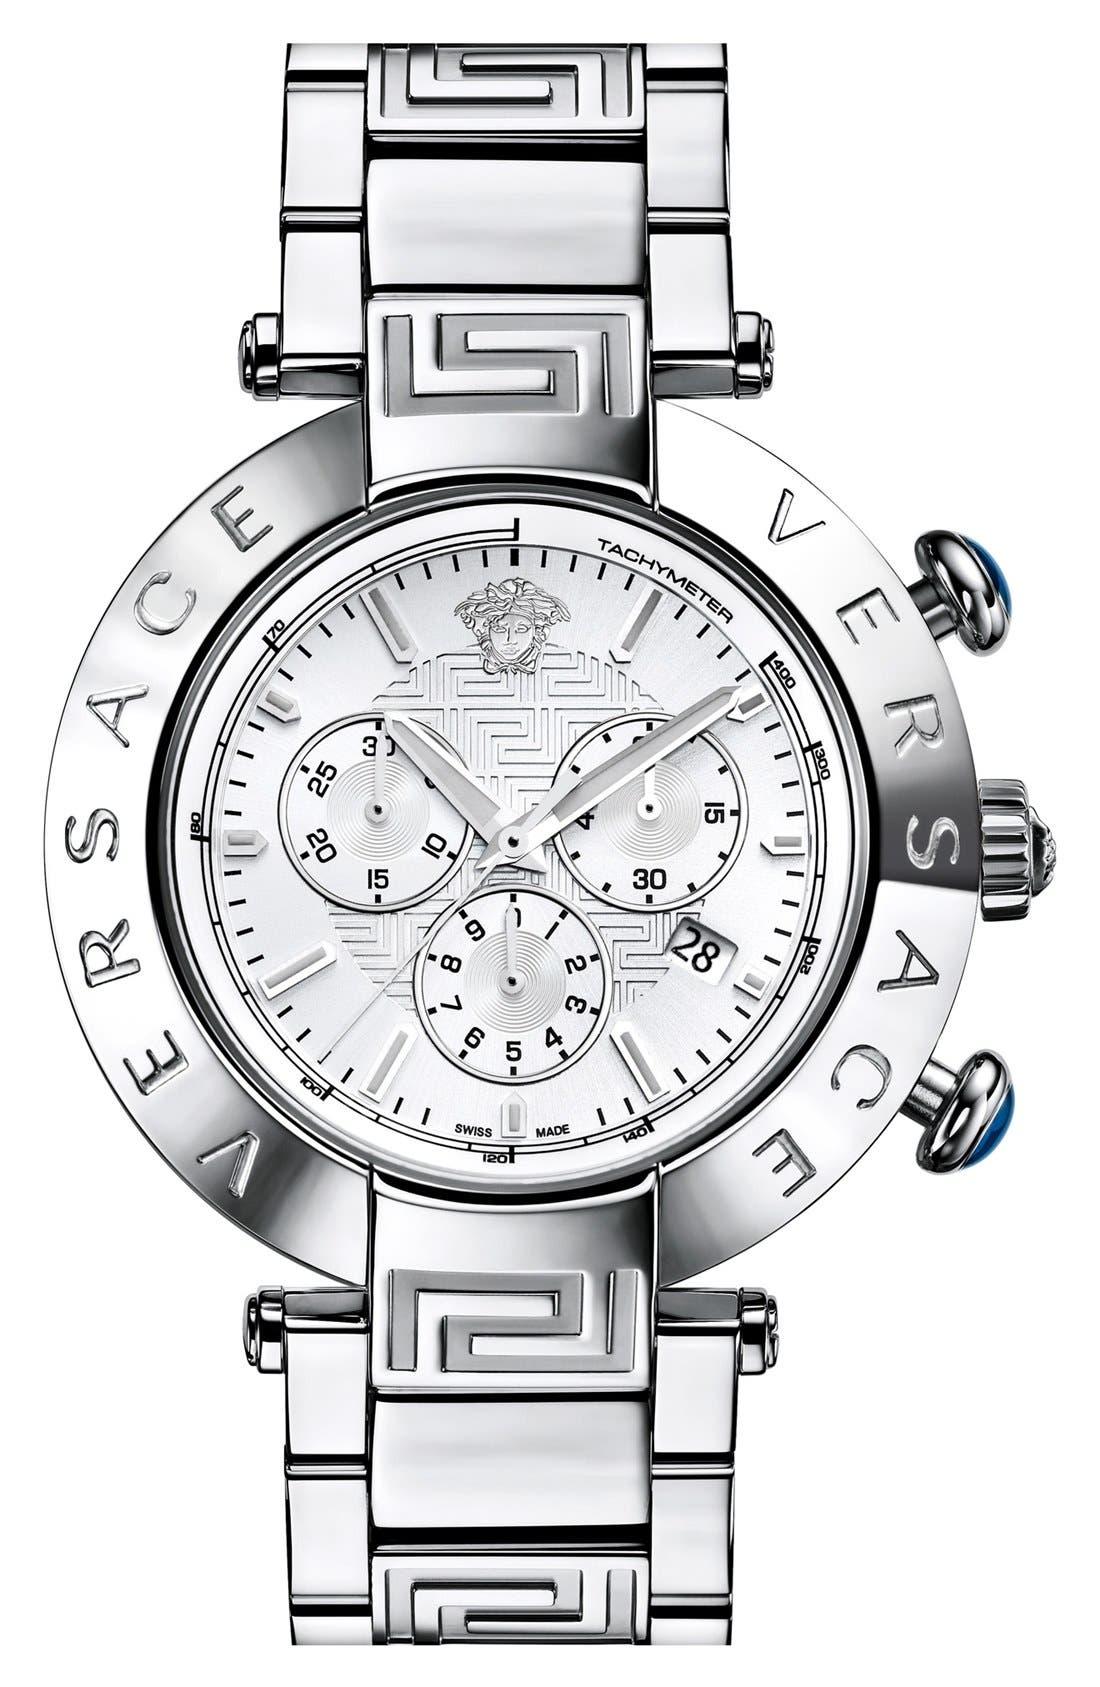 Alternate Image 1 Selected - Versace 'Reve Chrono' Bracelet Watch, 46mm